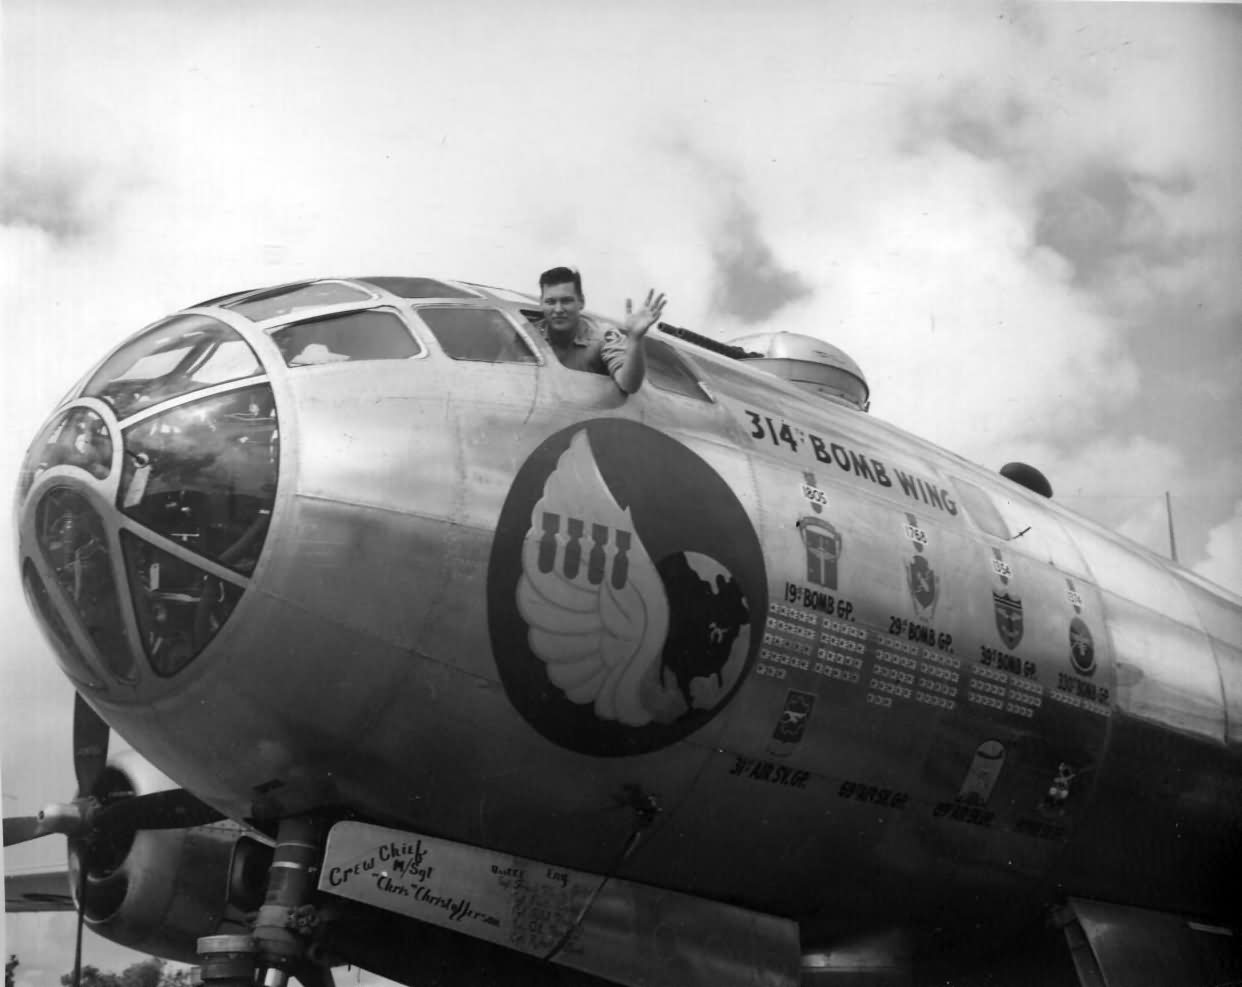 B-29 Superfortress 314th Bomb Wing at Guam 2